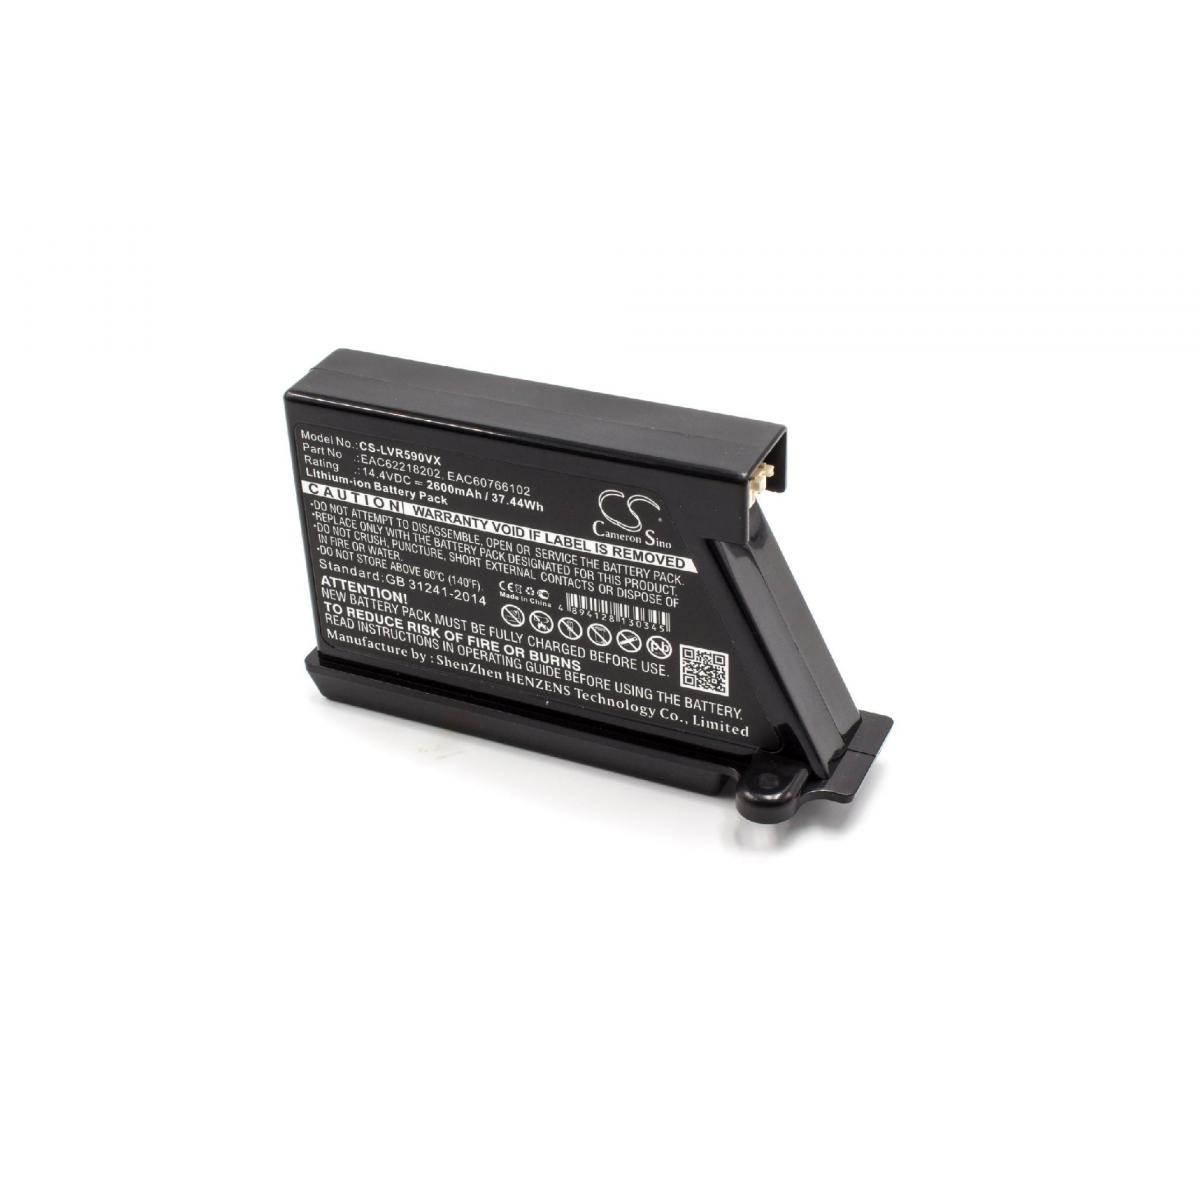 Vhbw vhbw Batterie compatible avec LG HOM-BOT 2,0, 3.0, CR3365RD, CR3465BB, CR5765GD robot électroménager (2600mAh, 14,4V, Li